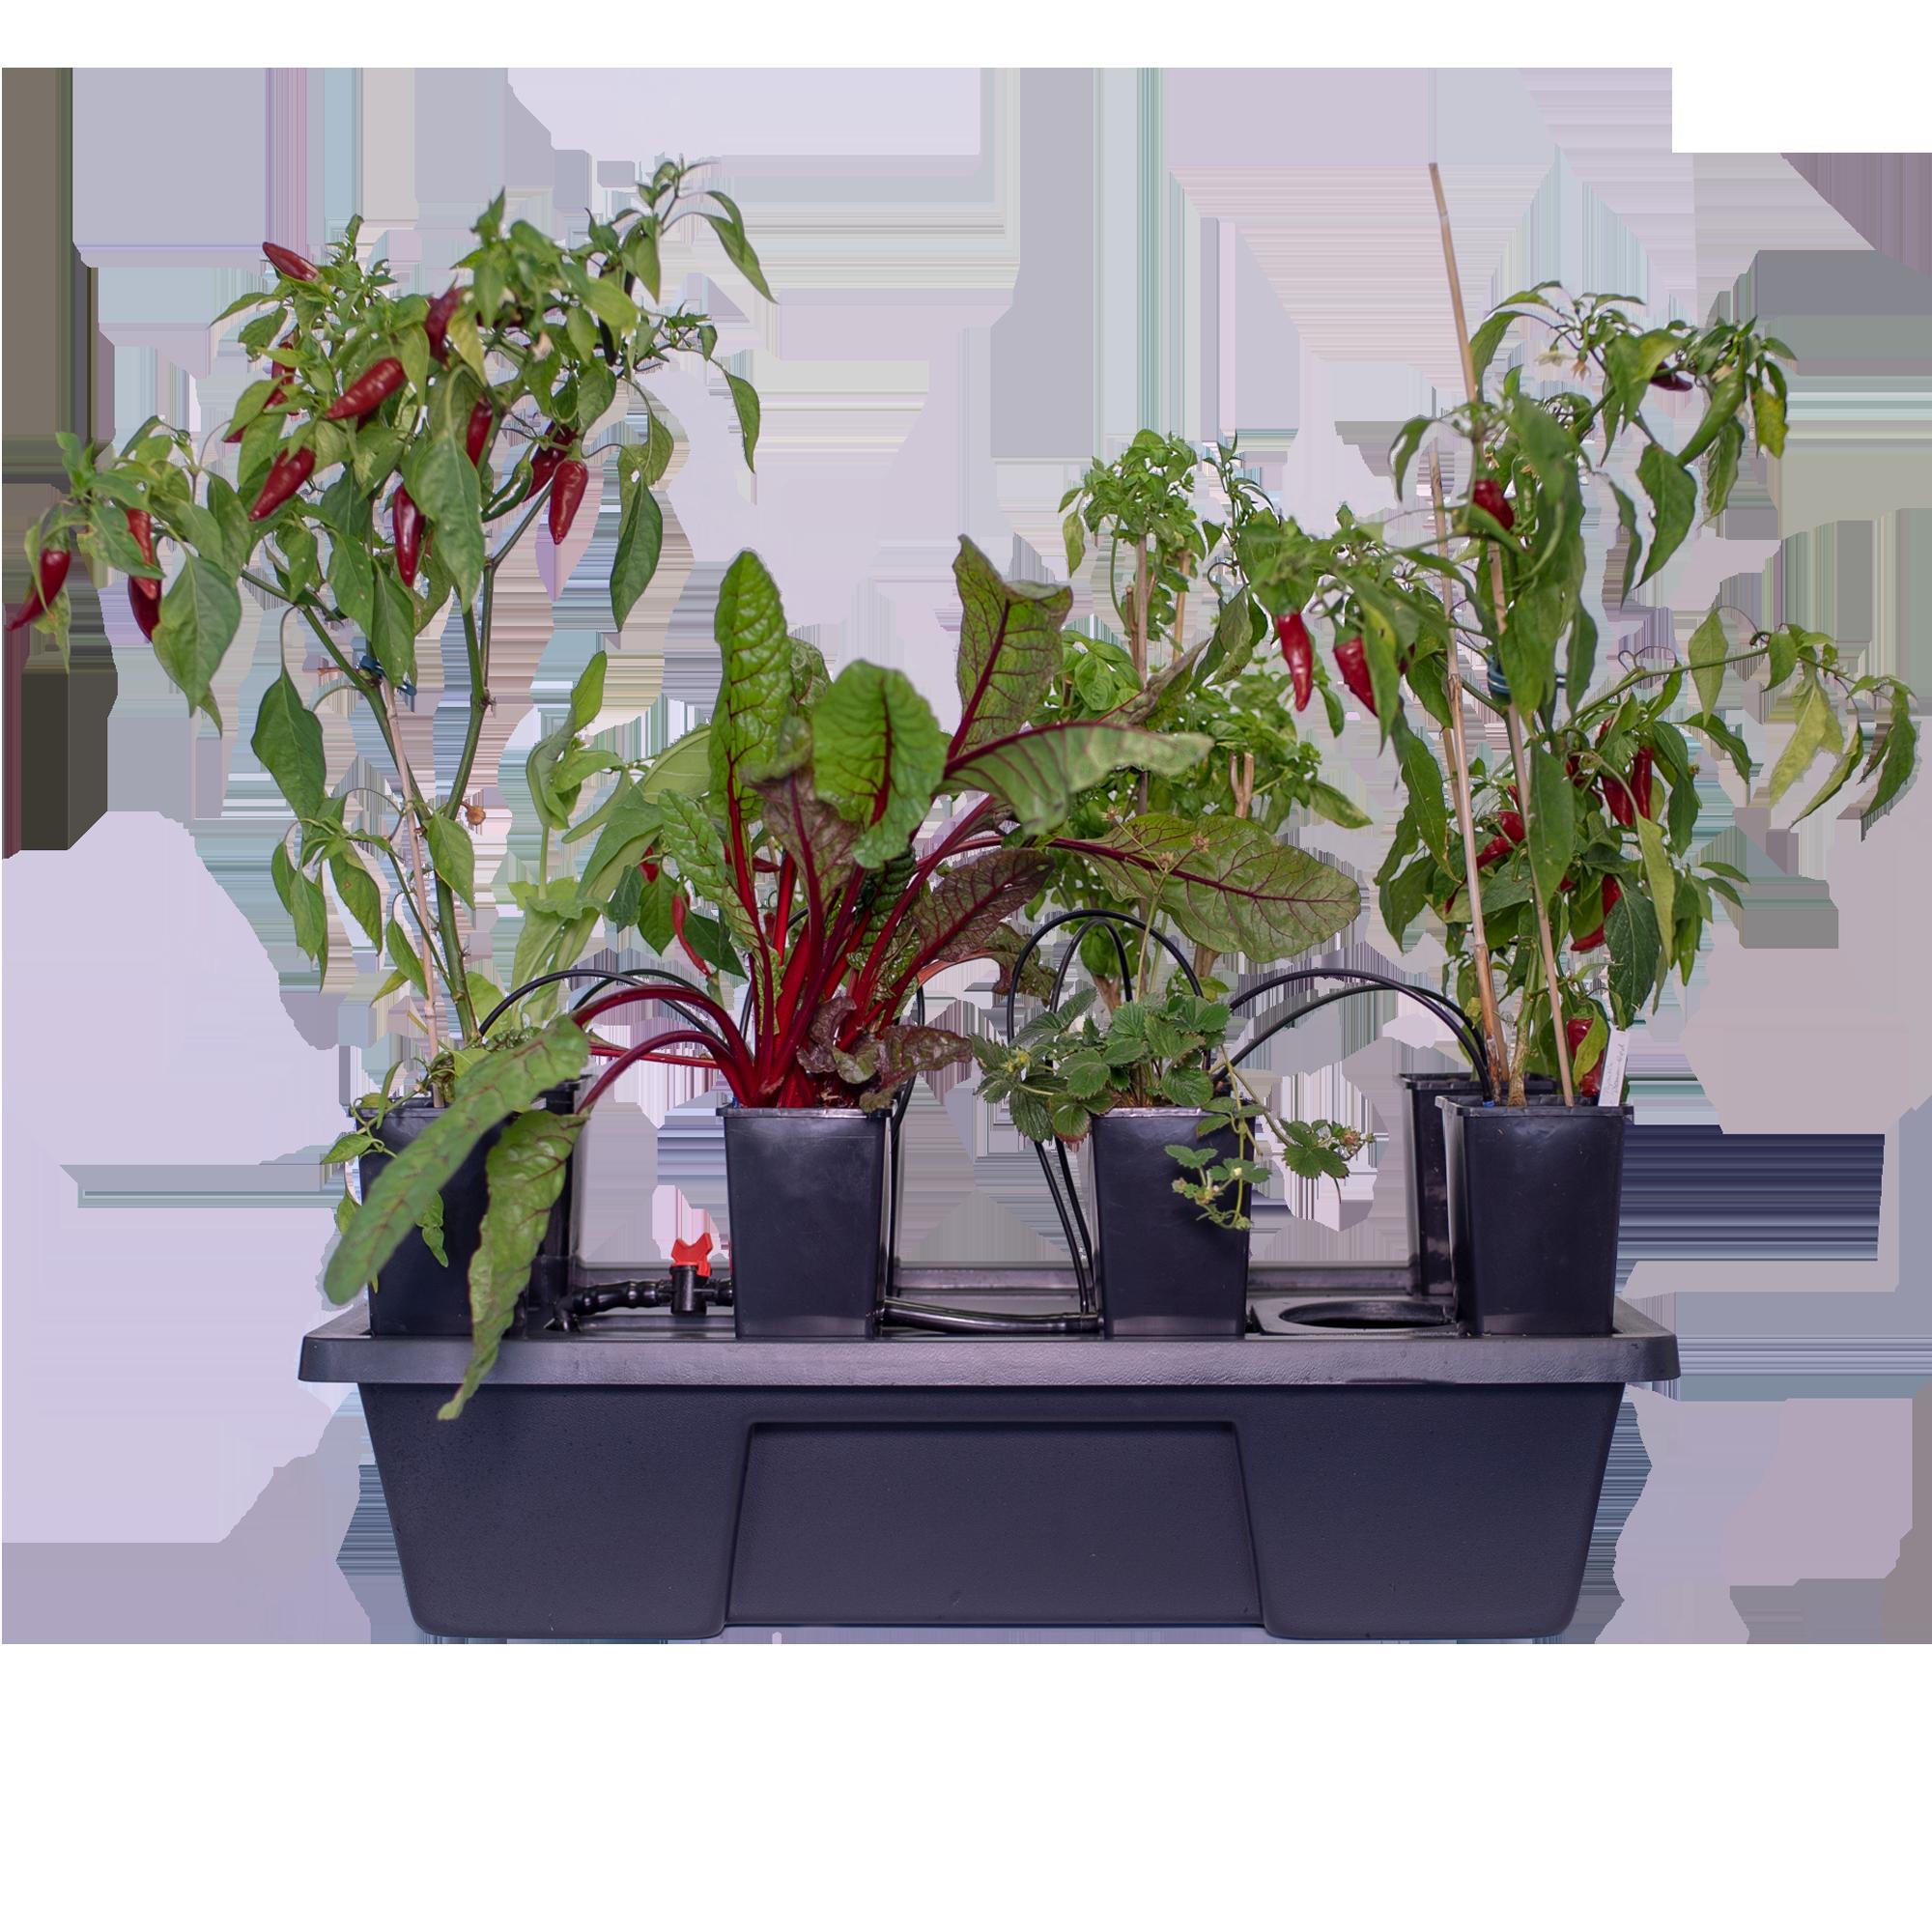 Atami Wilma System Mini 8 Pflanzen 2L Topf